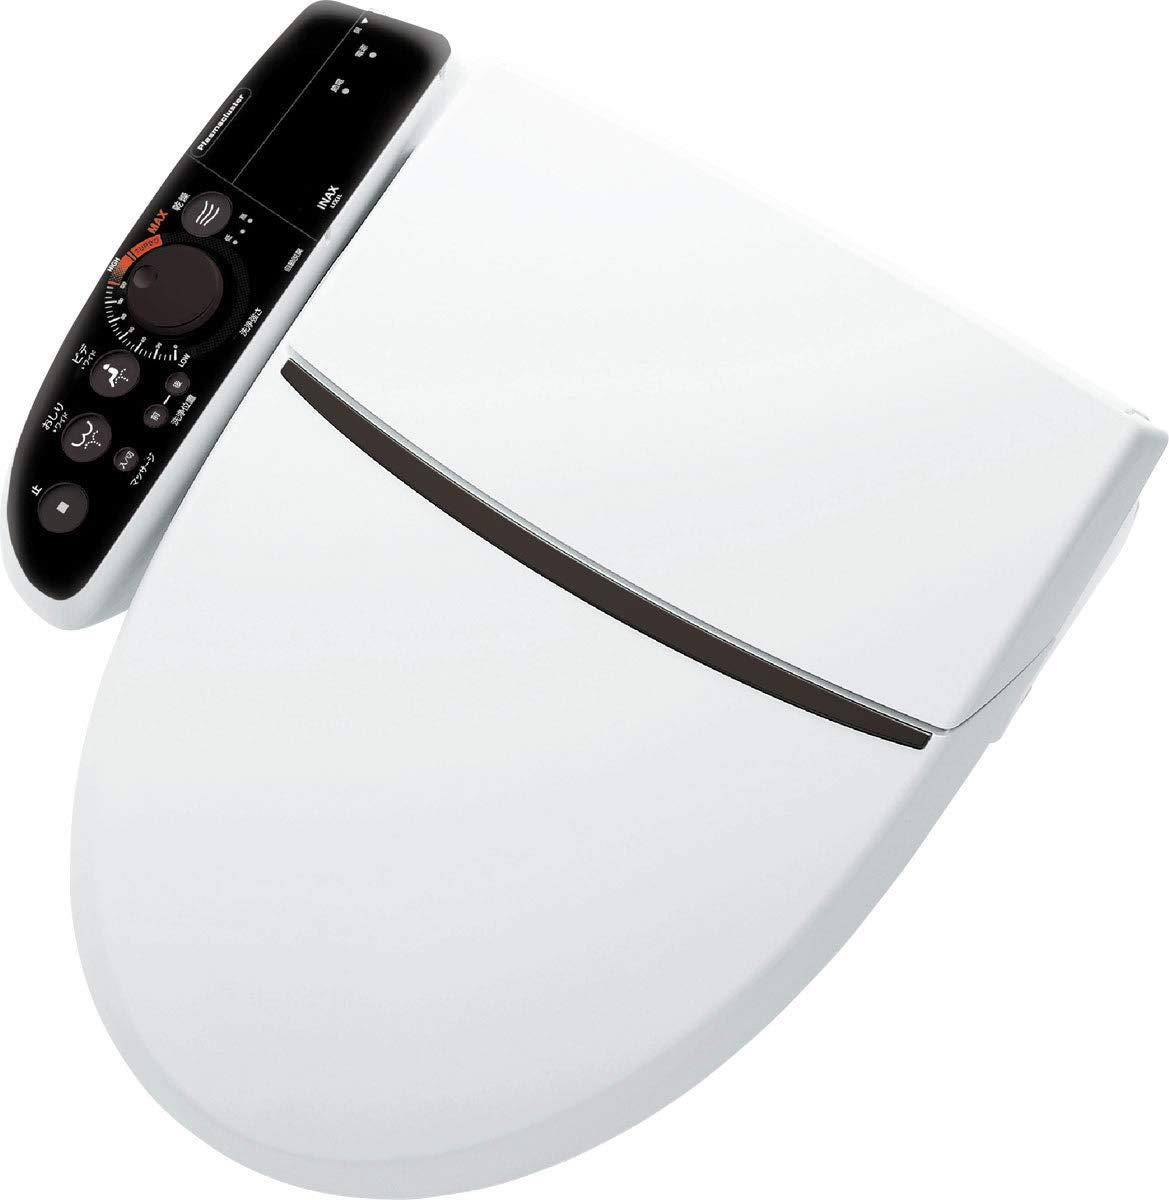 【CW-K45AQC】+【CWA-9】(壁リモコン) INAXLIXIL シャワートイレ Kシリーズエクストラ 大型共用便座 K45A 便器洗浄操作:フルオートリモコン式/アメージュシリーズ便器用 カラー:BN8(オフホワイト) B07JZFRBW3 BW1(ピュアホワイト)  BW1(ピュアホワイト)